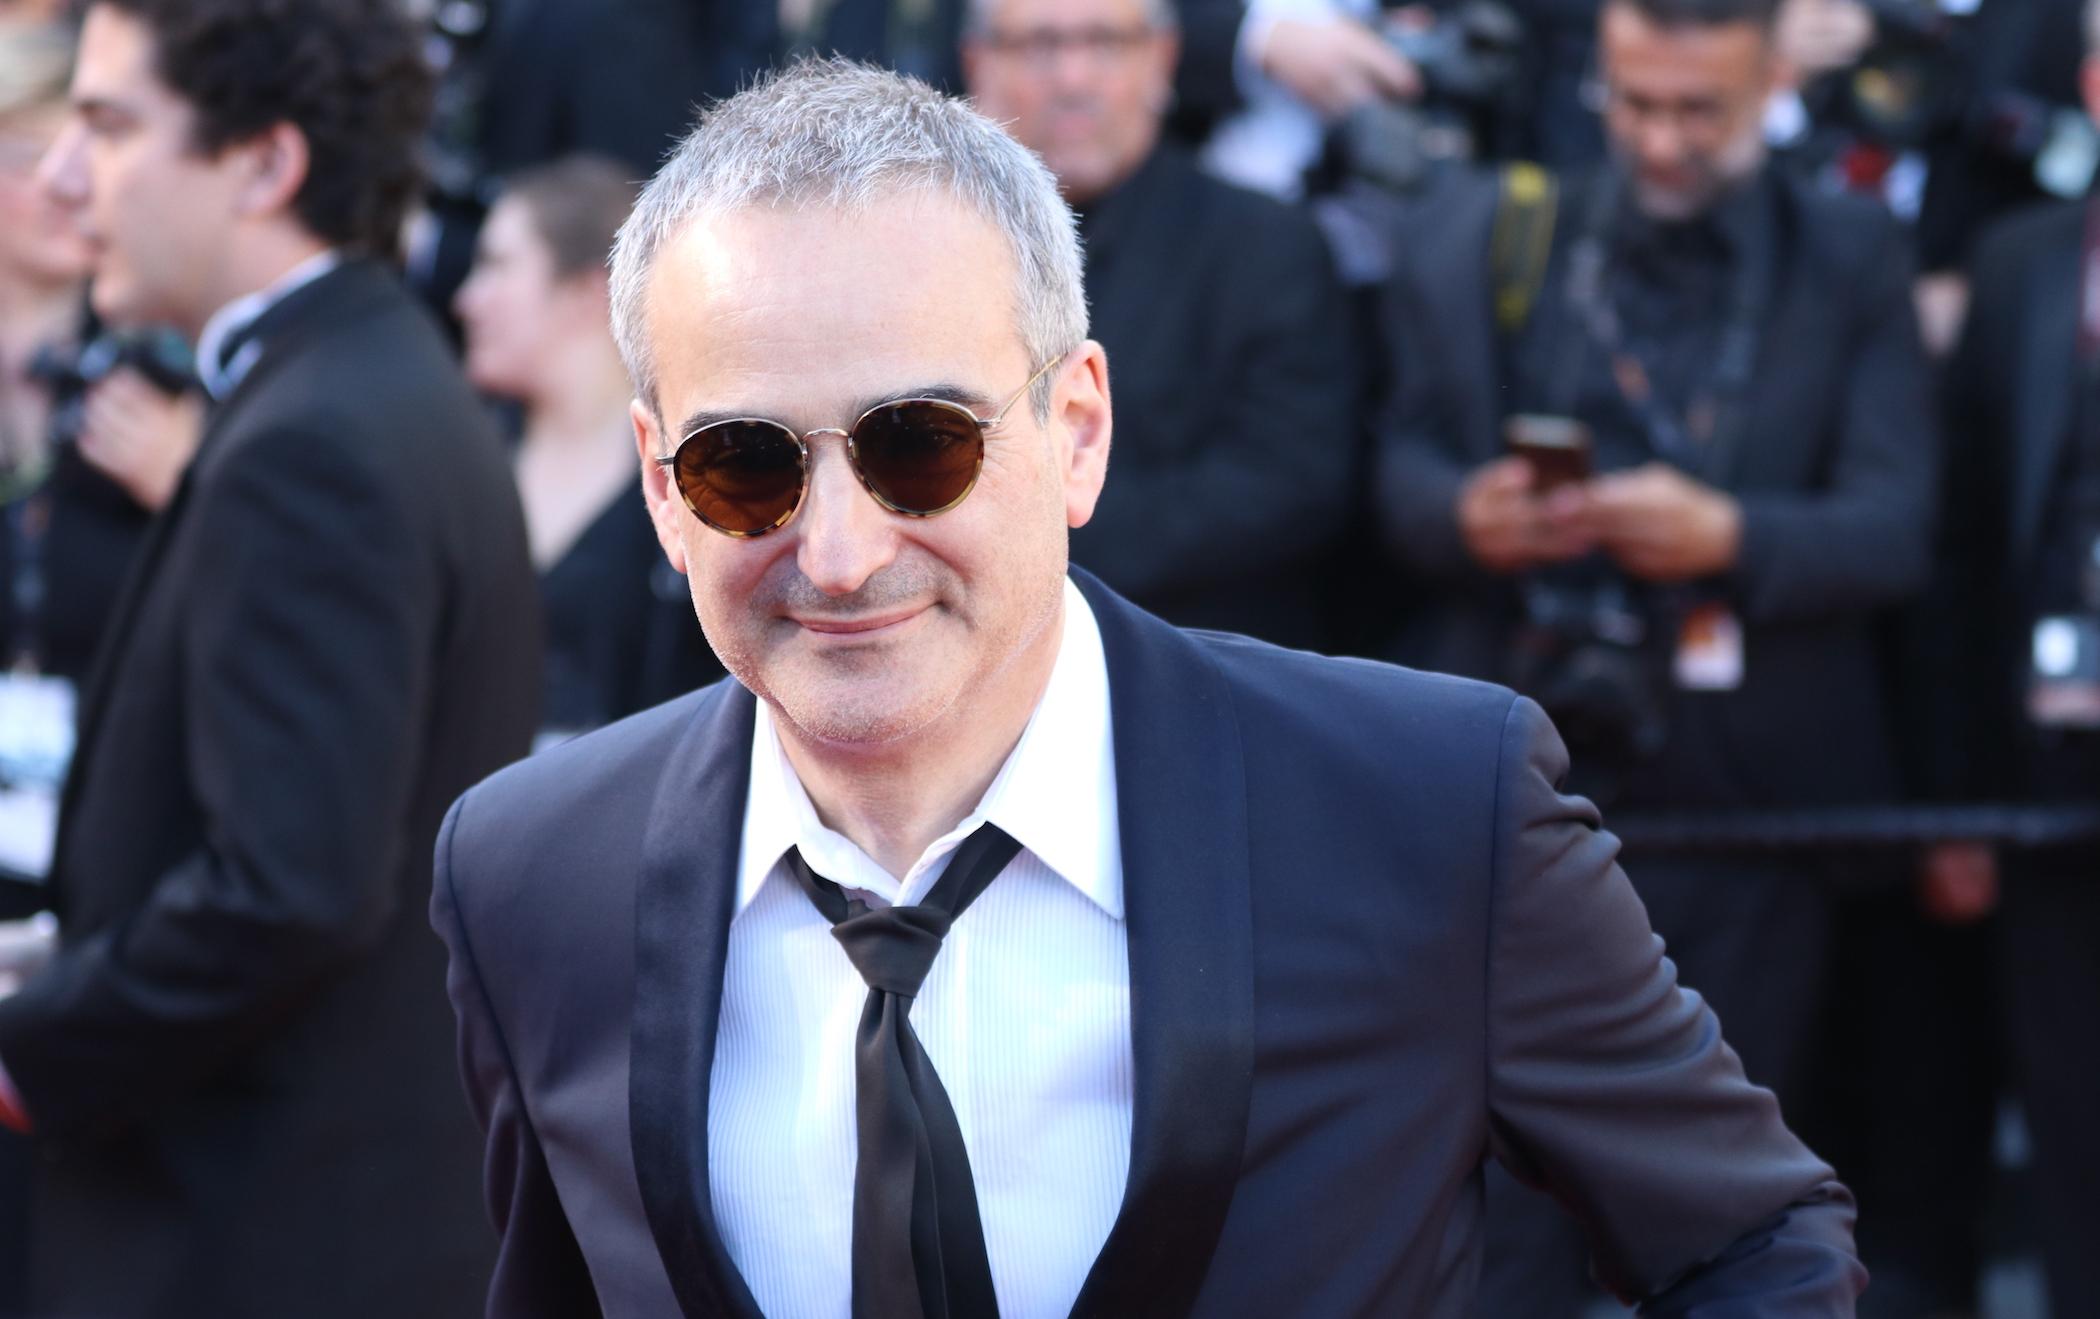 Cannes 2017: un sorridente Olivier Assayas sul red carpet inaugurale